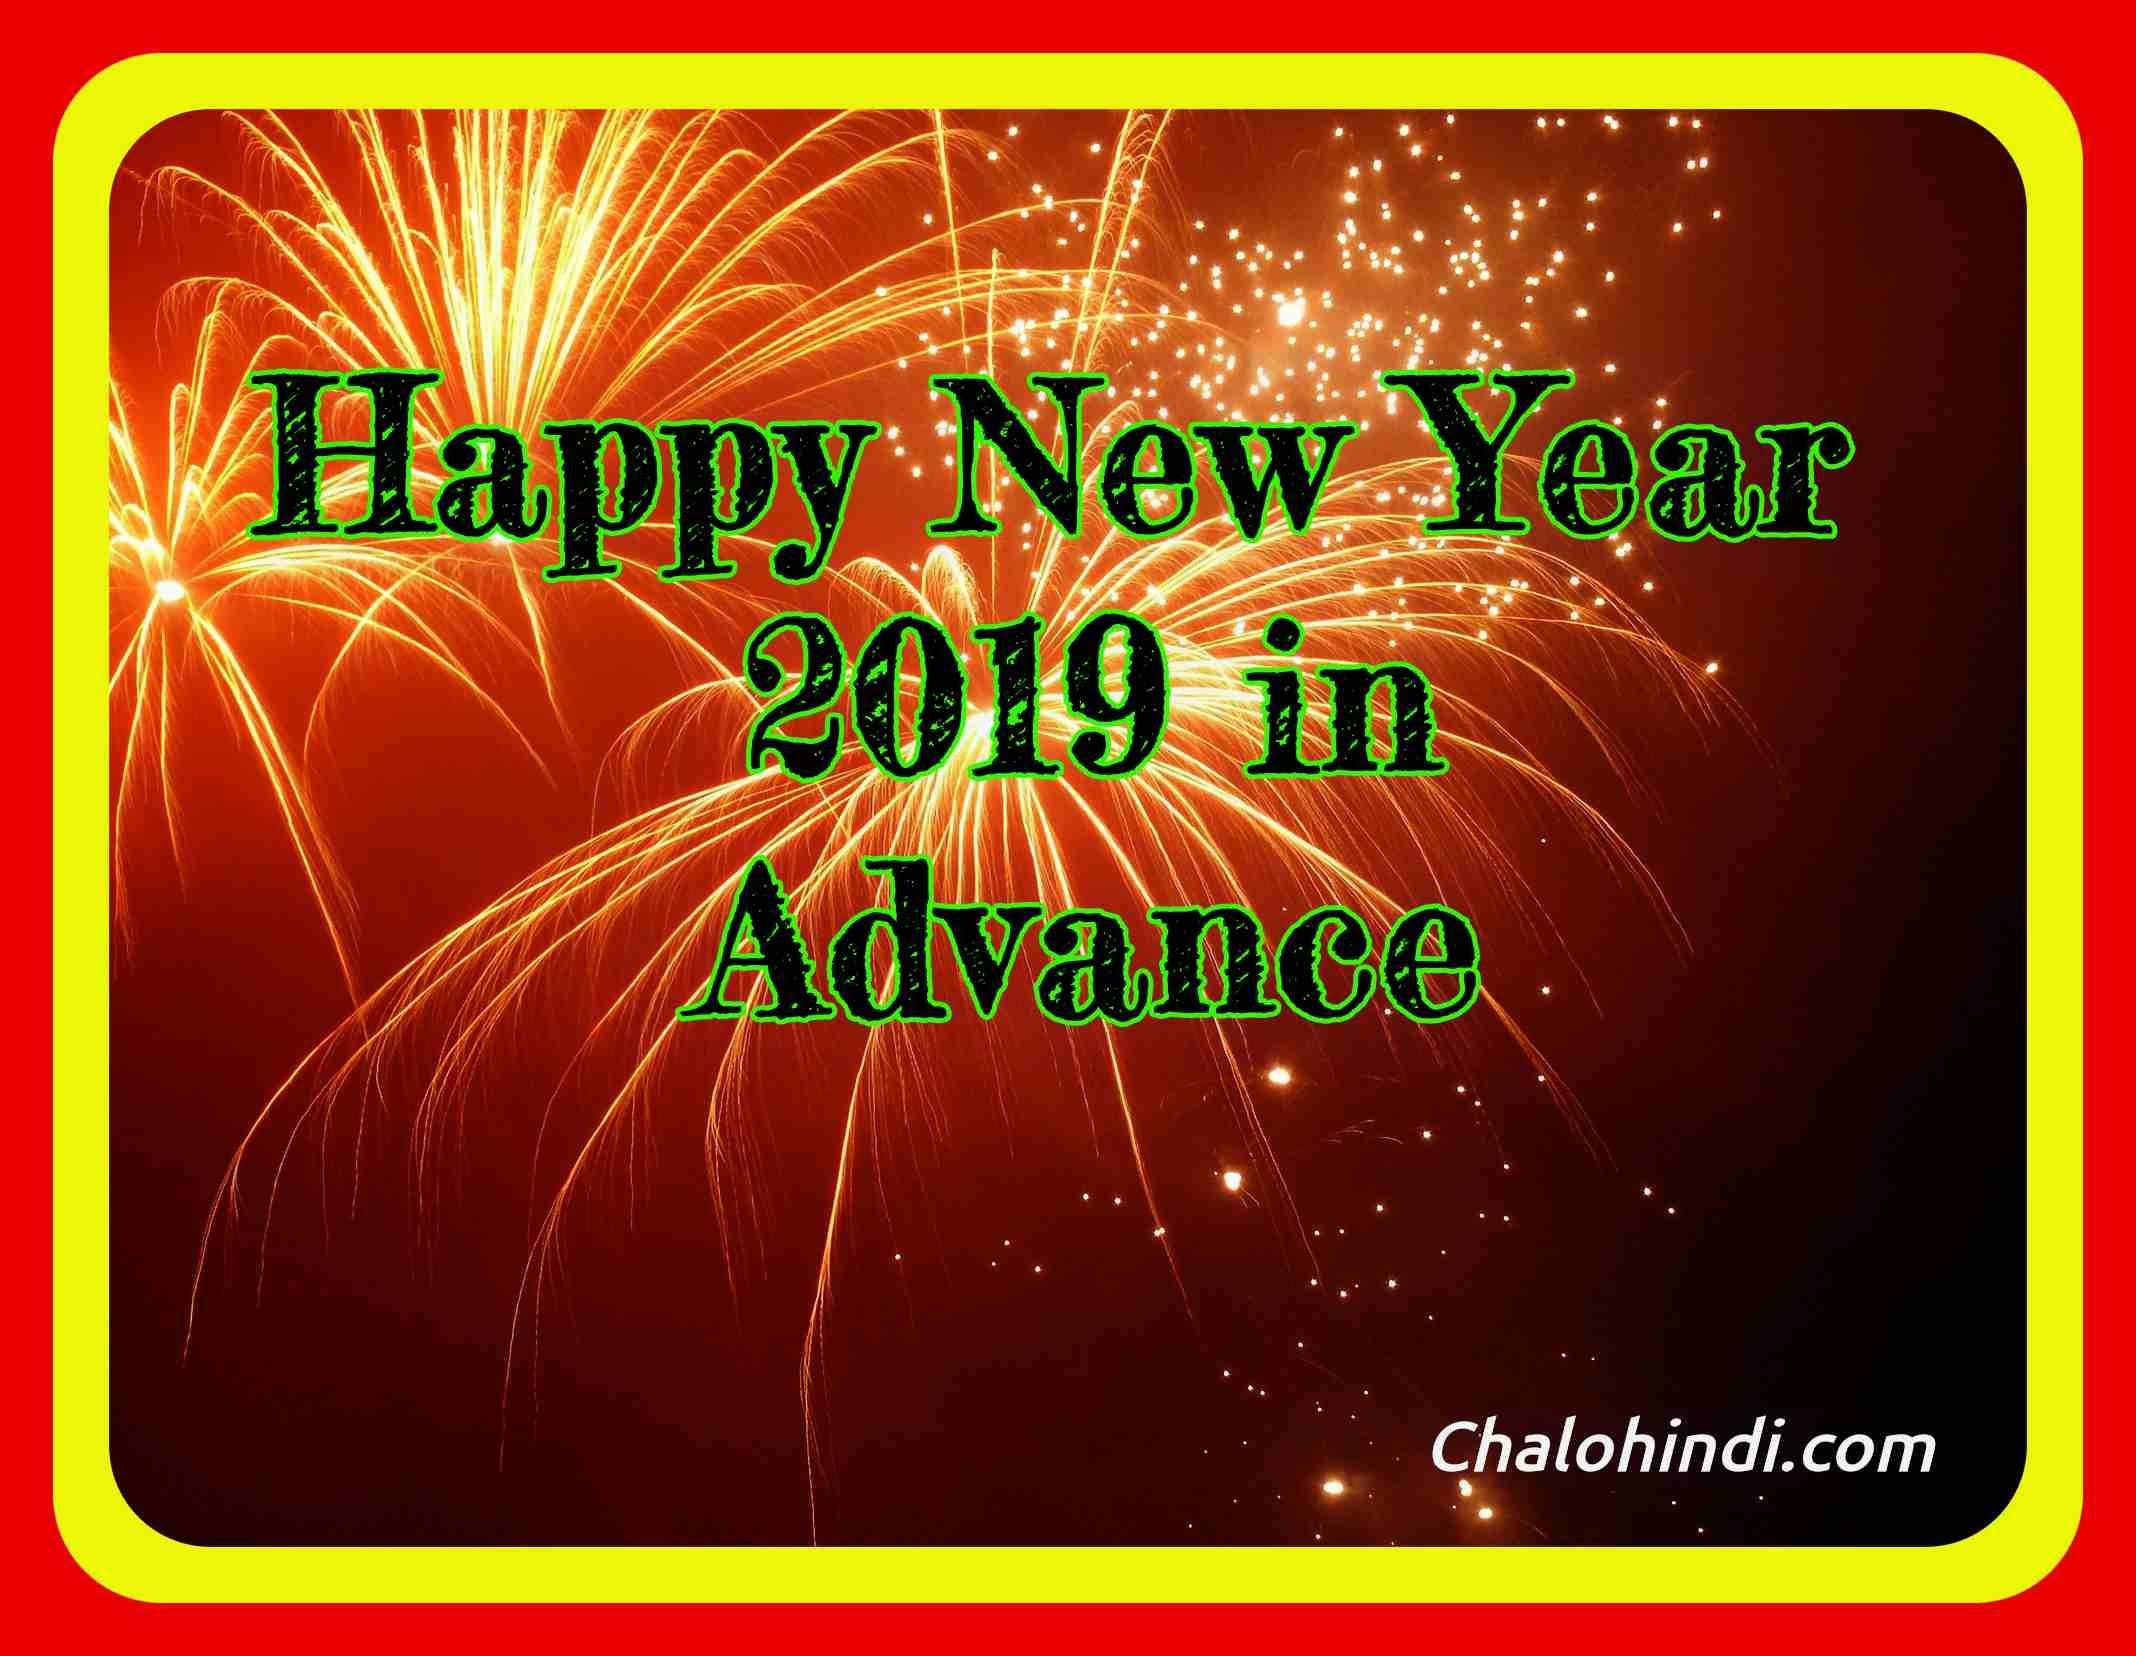 Happy New Year 2019 Quotes, Shayari, Images, SMS Happy